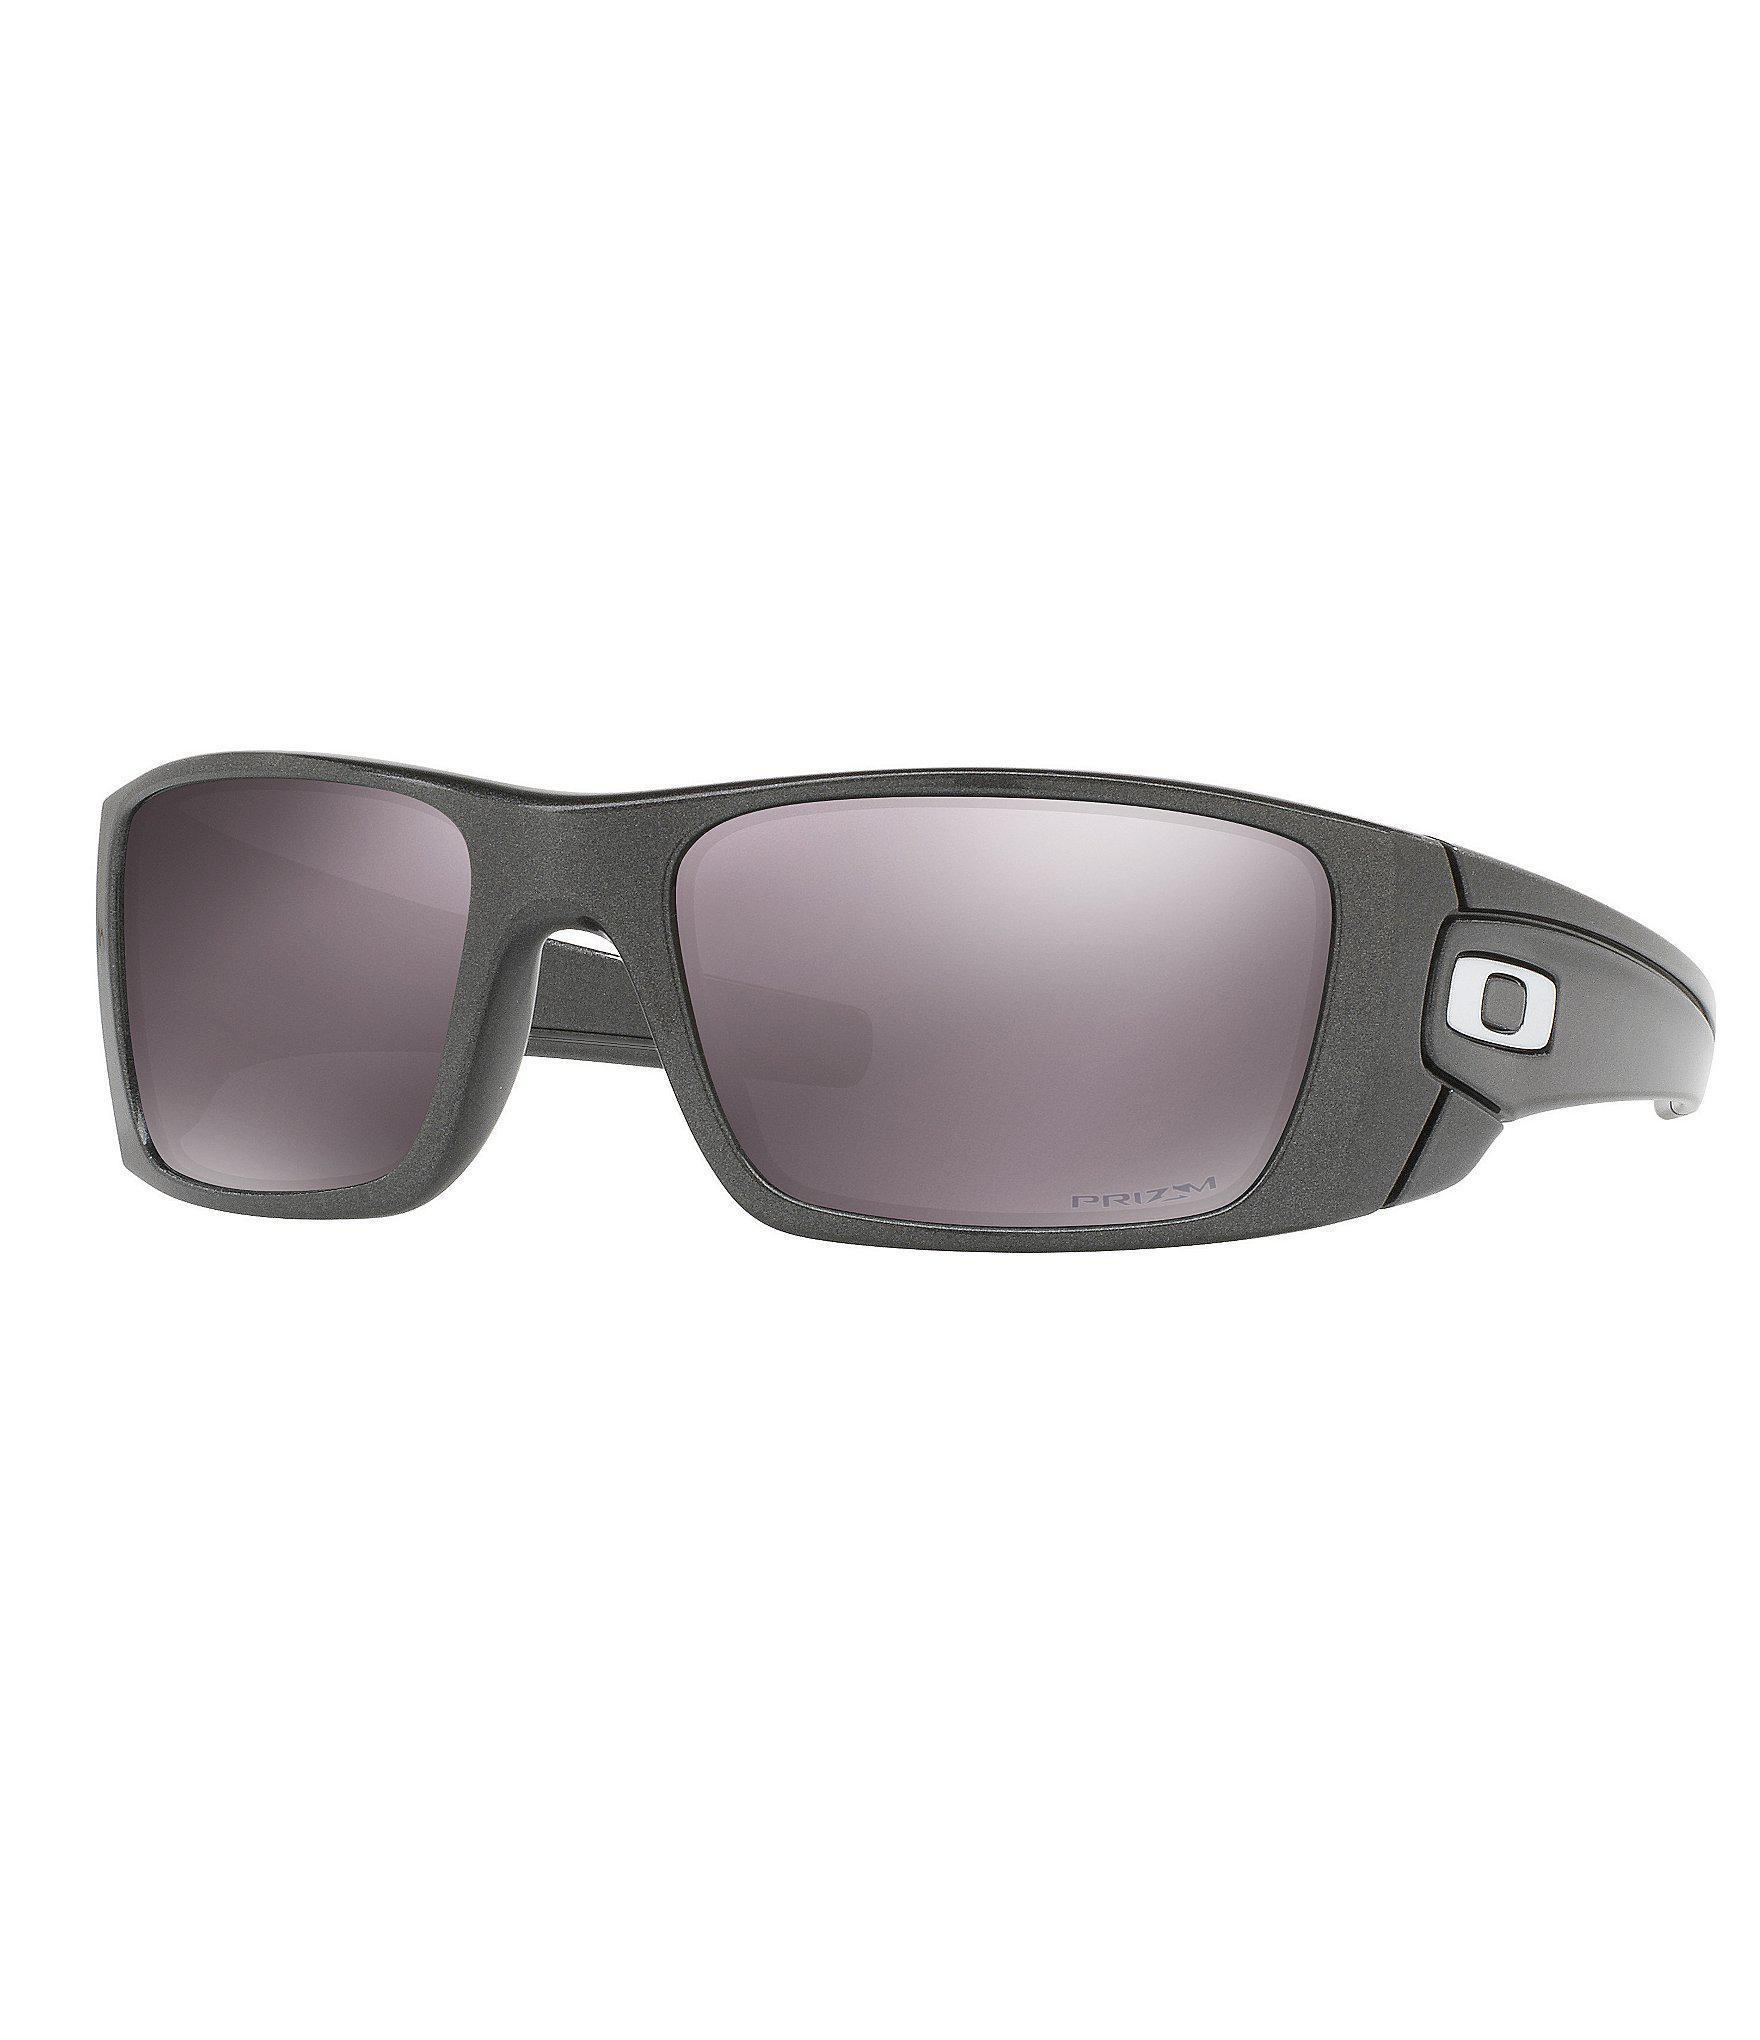 db847eb7a ... inexpensive oakley. mens gray fuel cell granite daily prizm polarized  mirrored wrap sunglasses fb90f d7849